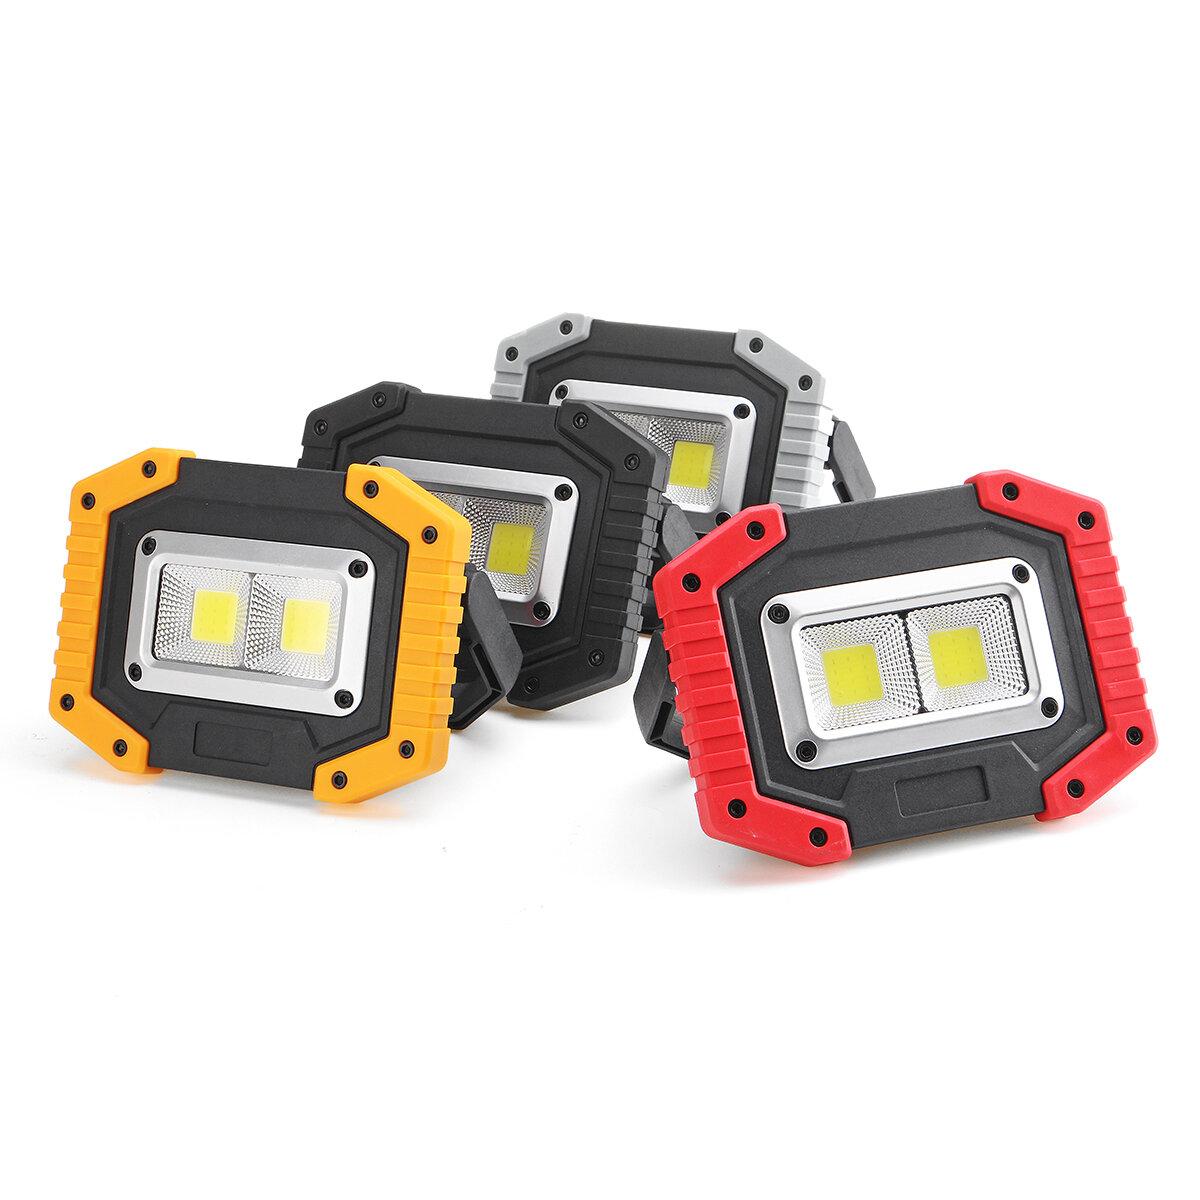 XANES® 24C 30W COB LED Work Light Водонепроницаемы Аккумуляторная LED Прожектор для На открытом воздухе Кемпинг Hiking Р